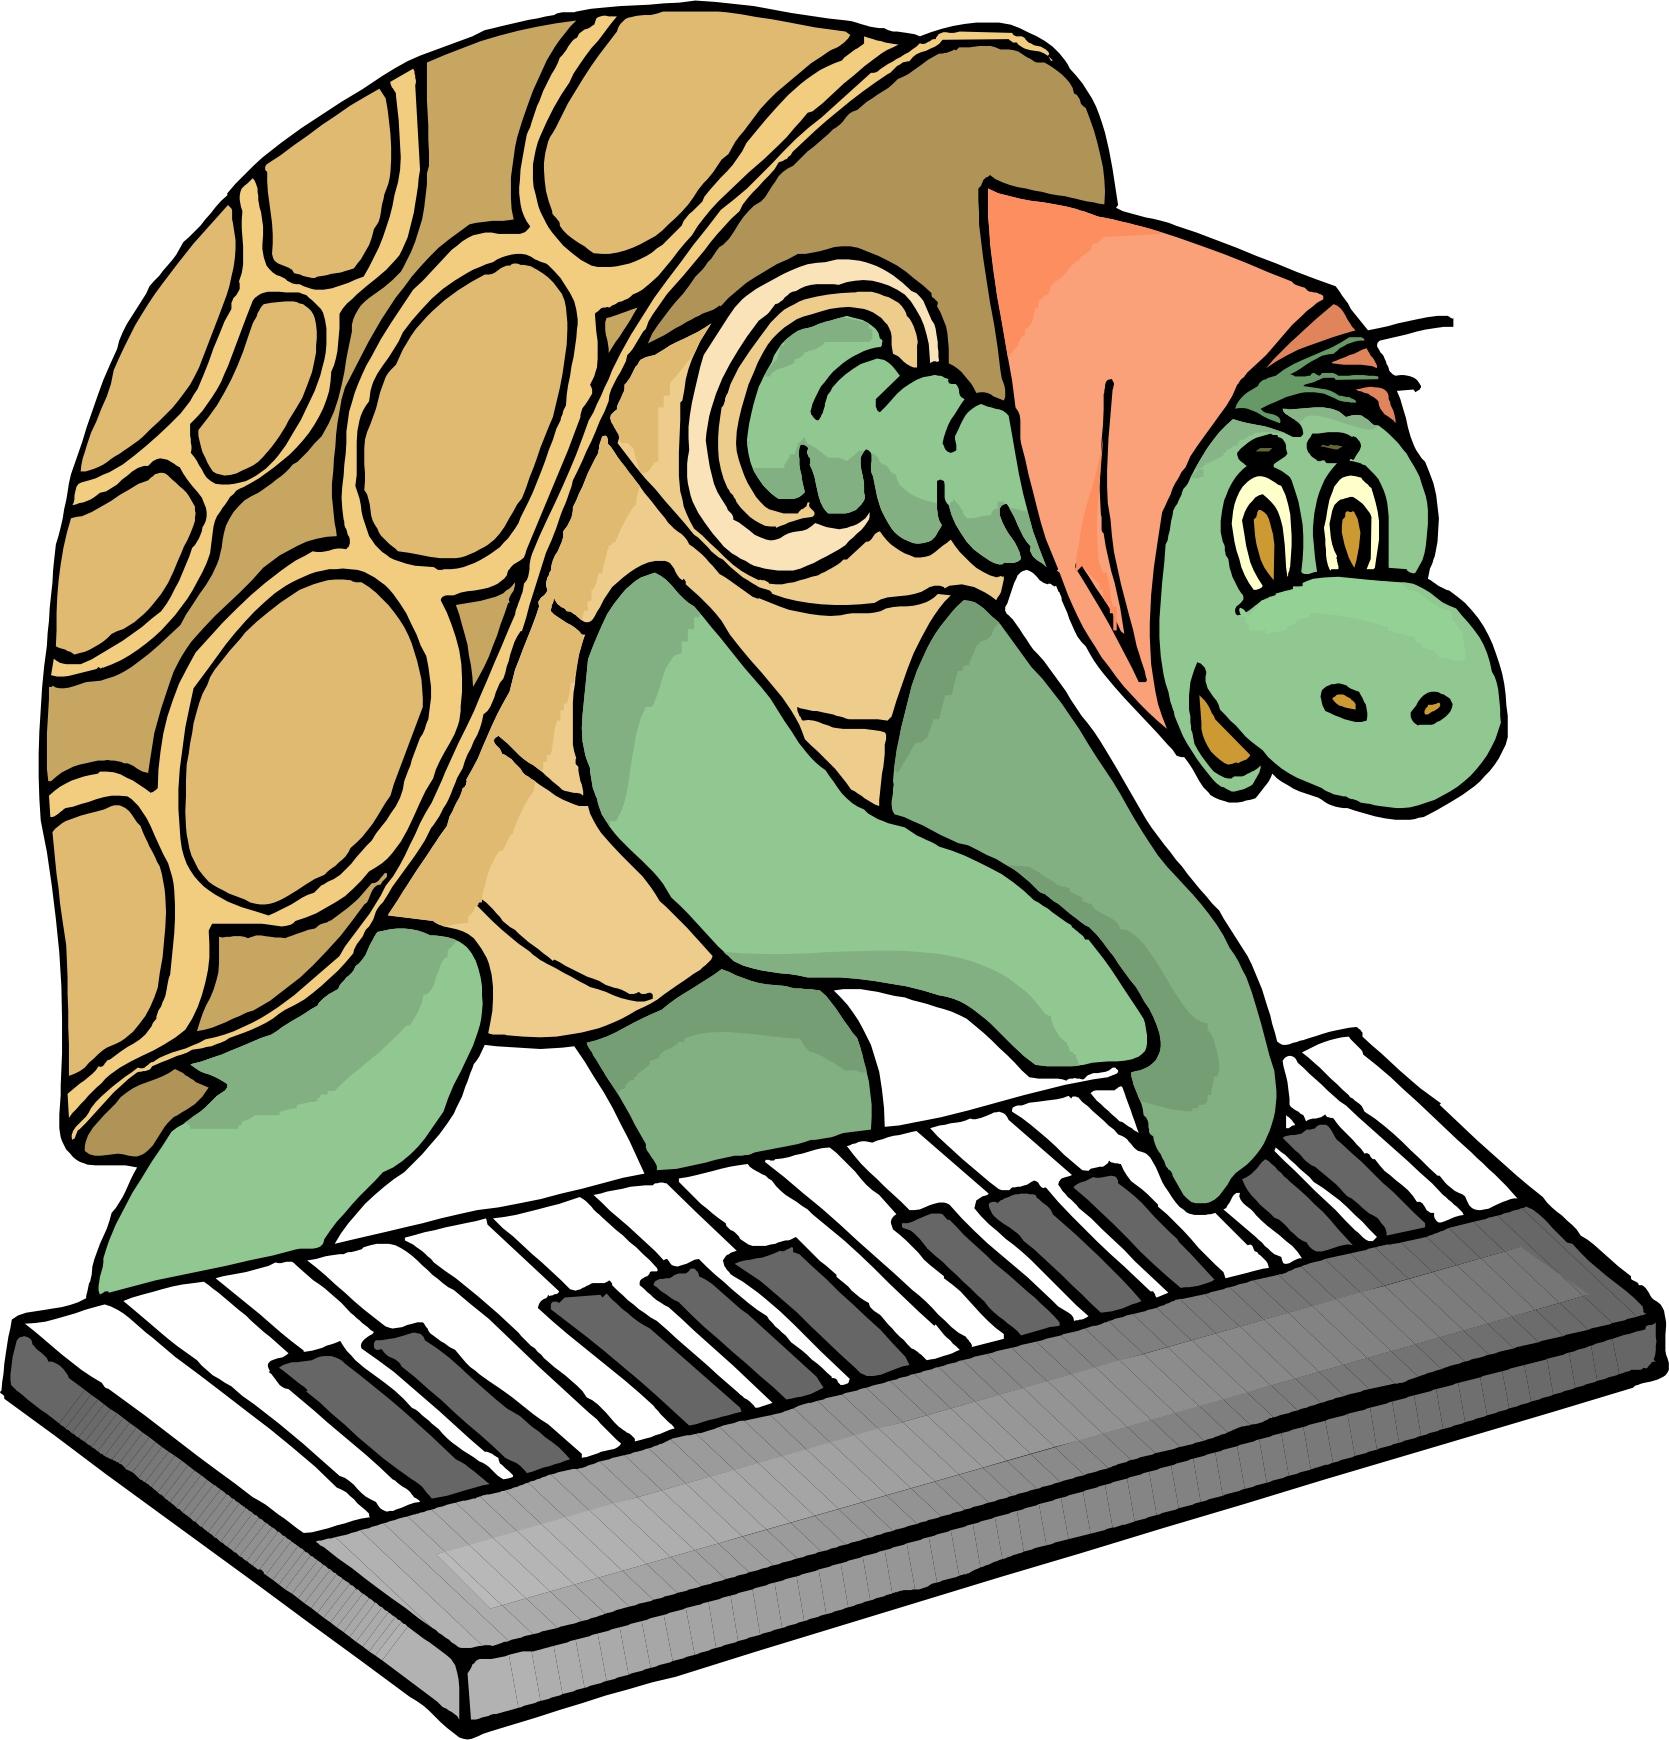 Free Piano Cartoon Cliparts, Download Free Clip Art, Free.